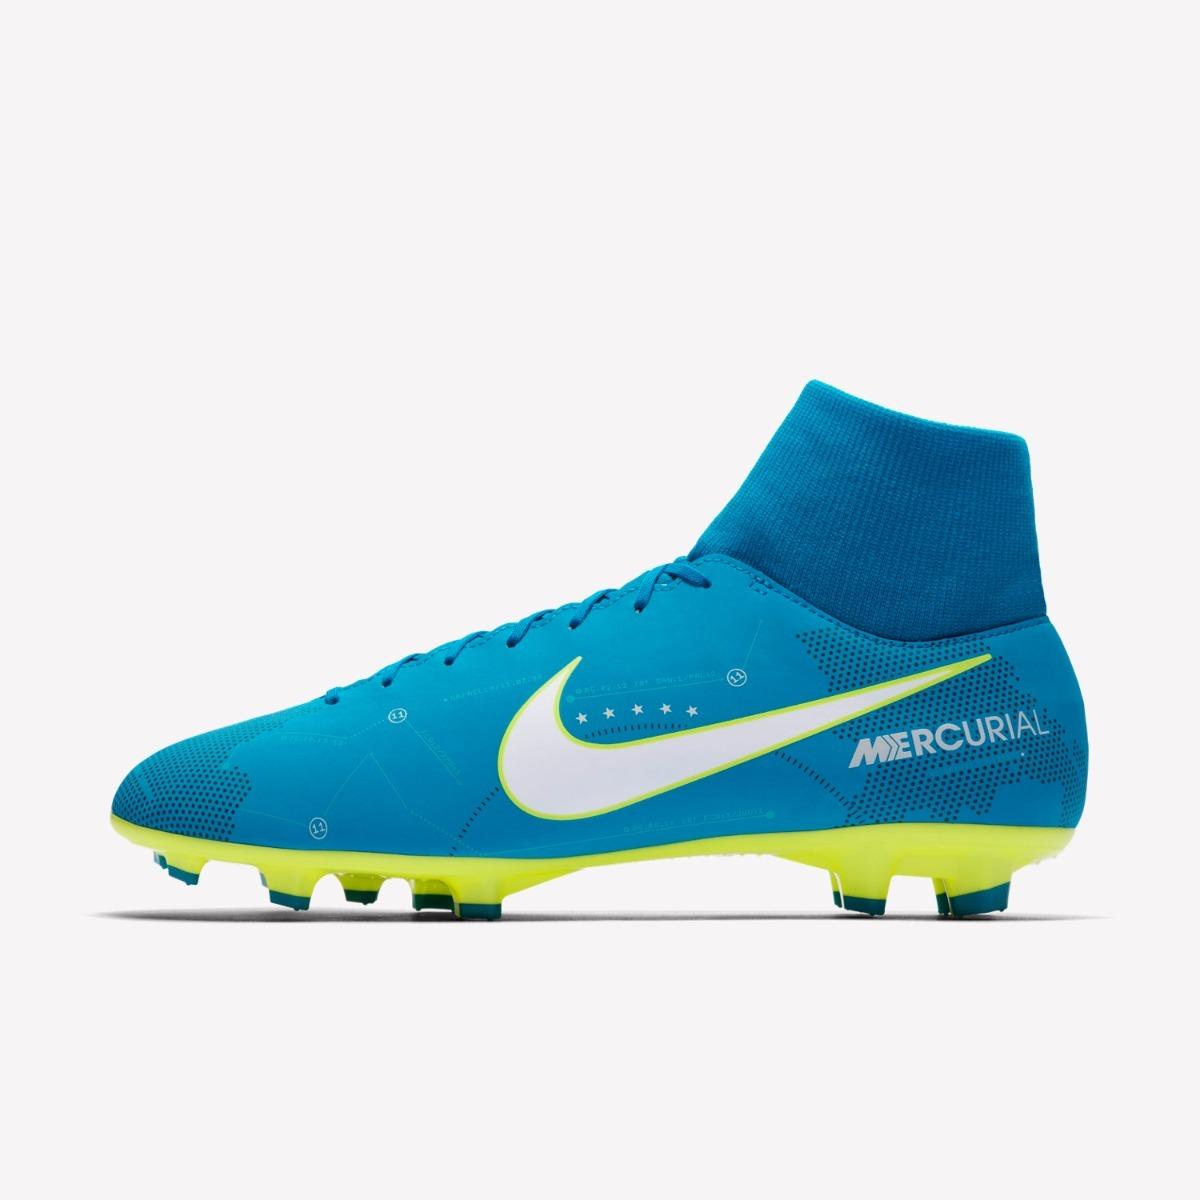 quality design 00bfd 15ea9 guayos nike mercurial neymar bota fútbol victory fg - new. Cargando zoom.